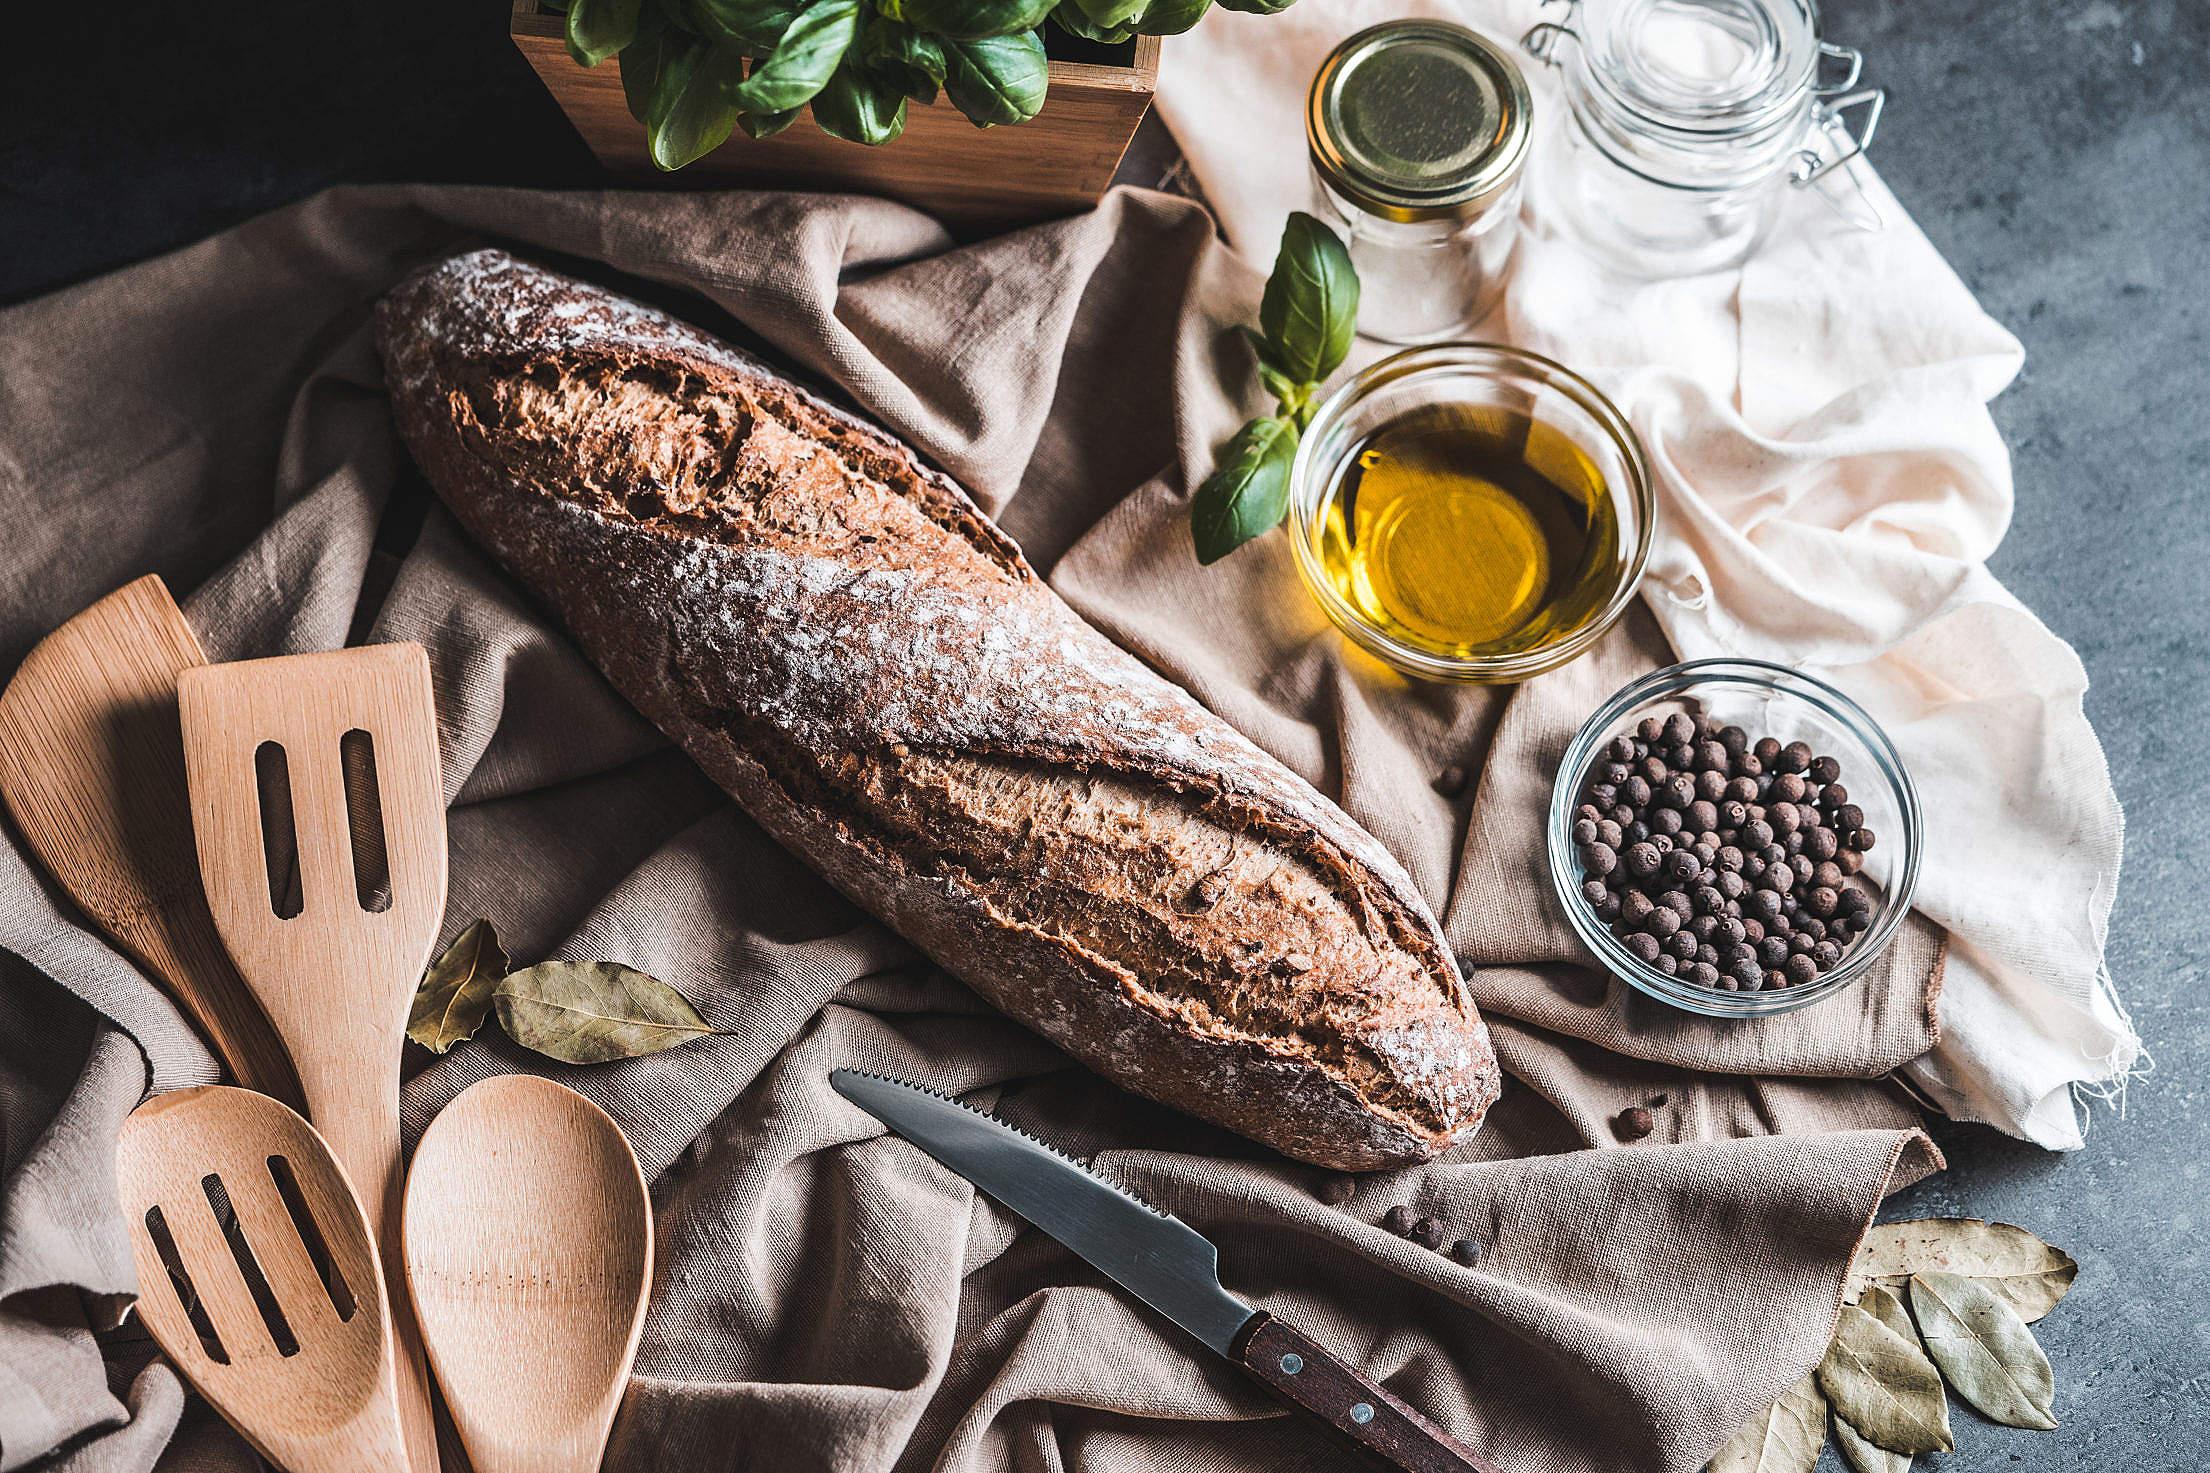 Crispy Homemade Whole Grain Baguette Free Stock Photo